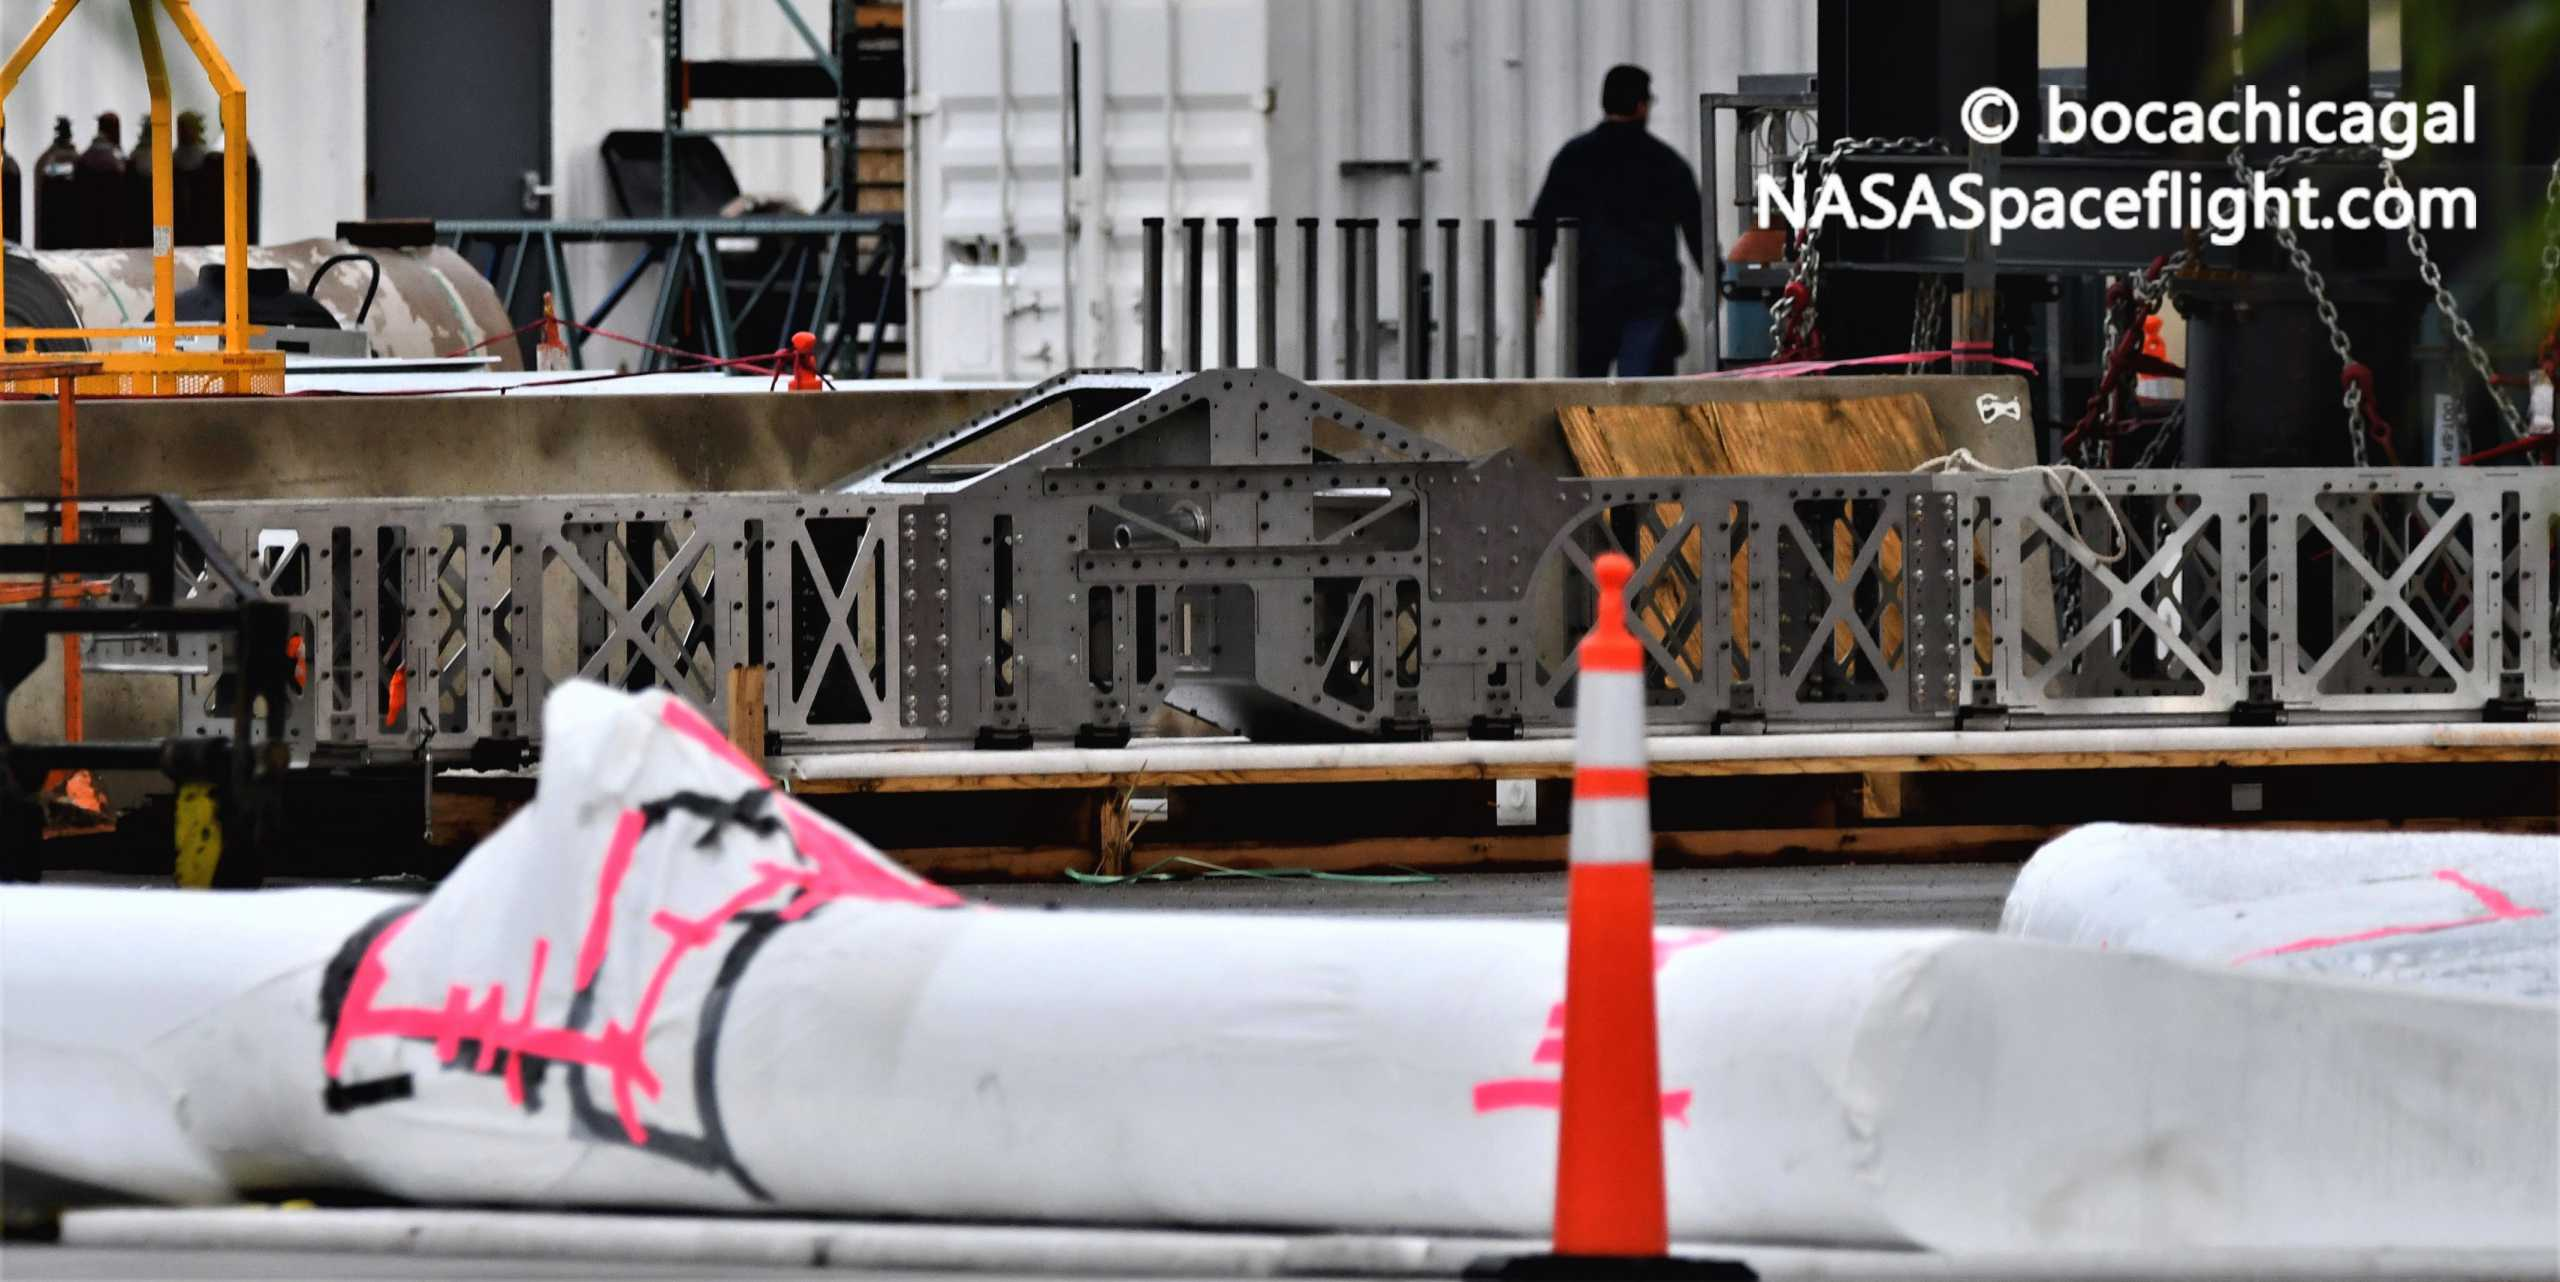 Starship Boca Chica 091520 (NASASpaceflight – bocachicagal) SN8 flap mount 1 crop (c)